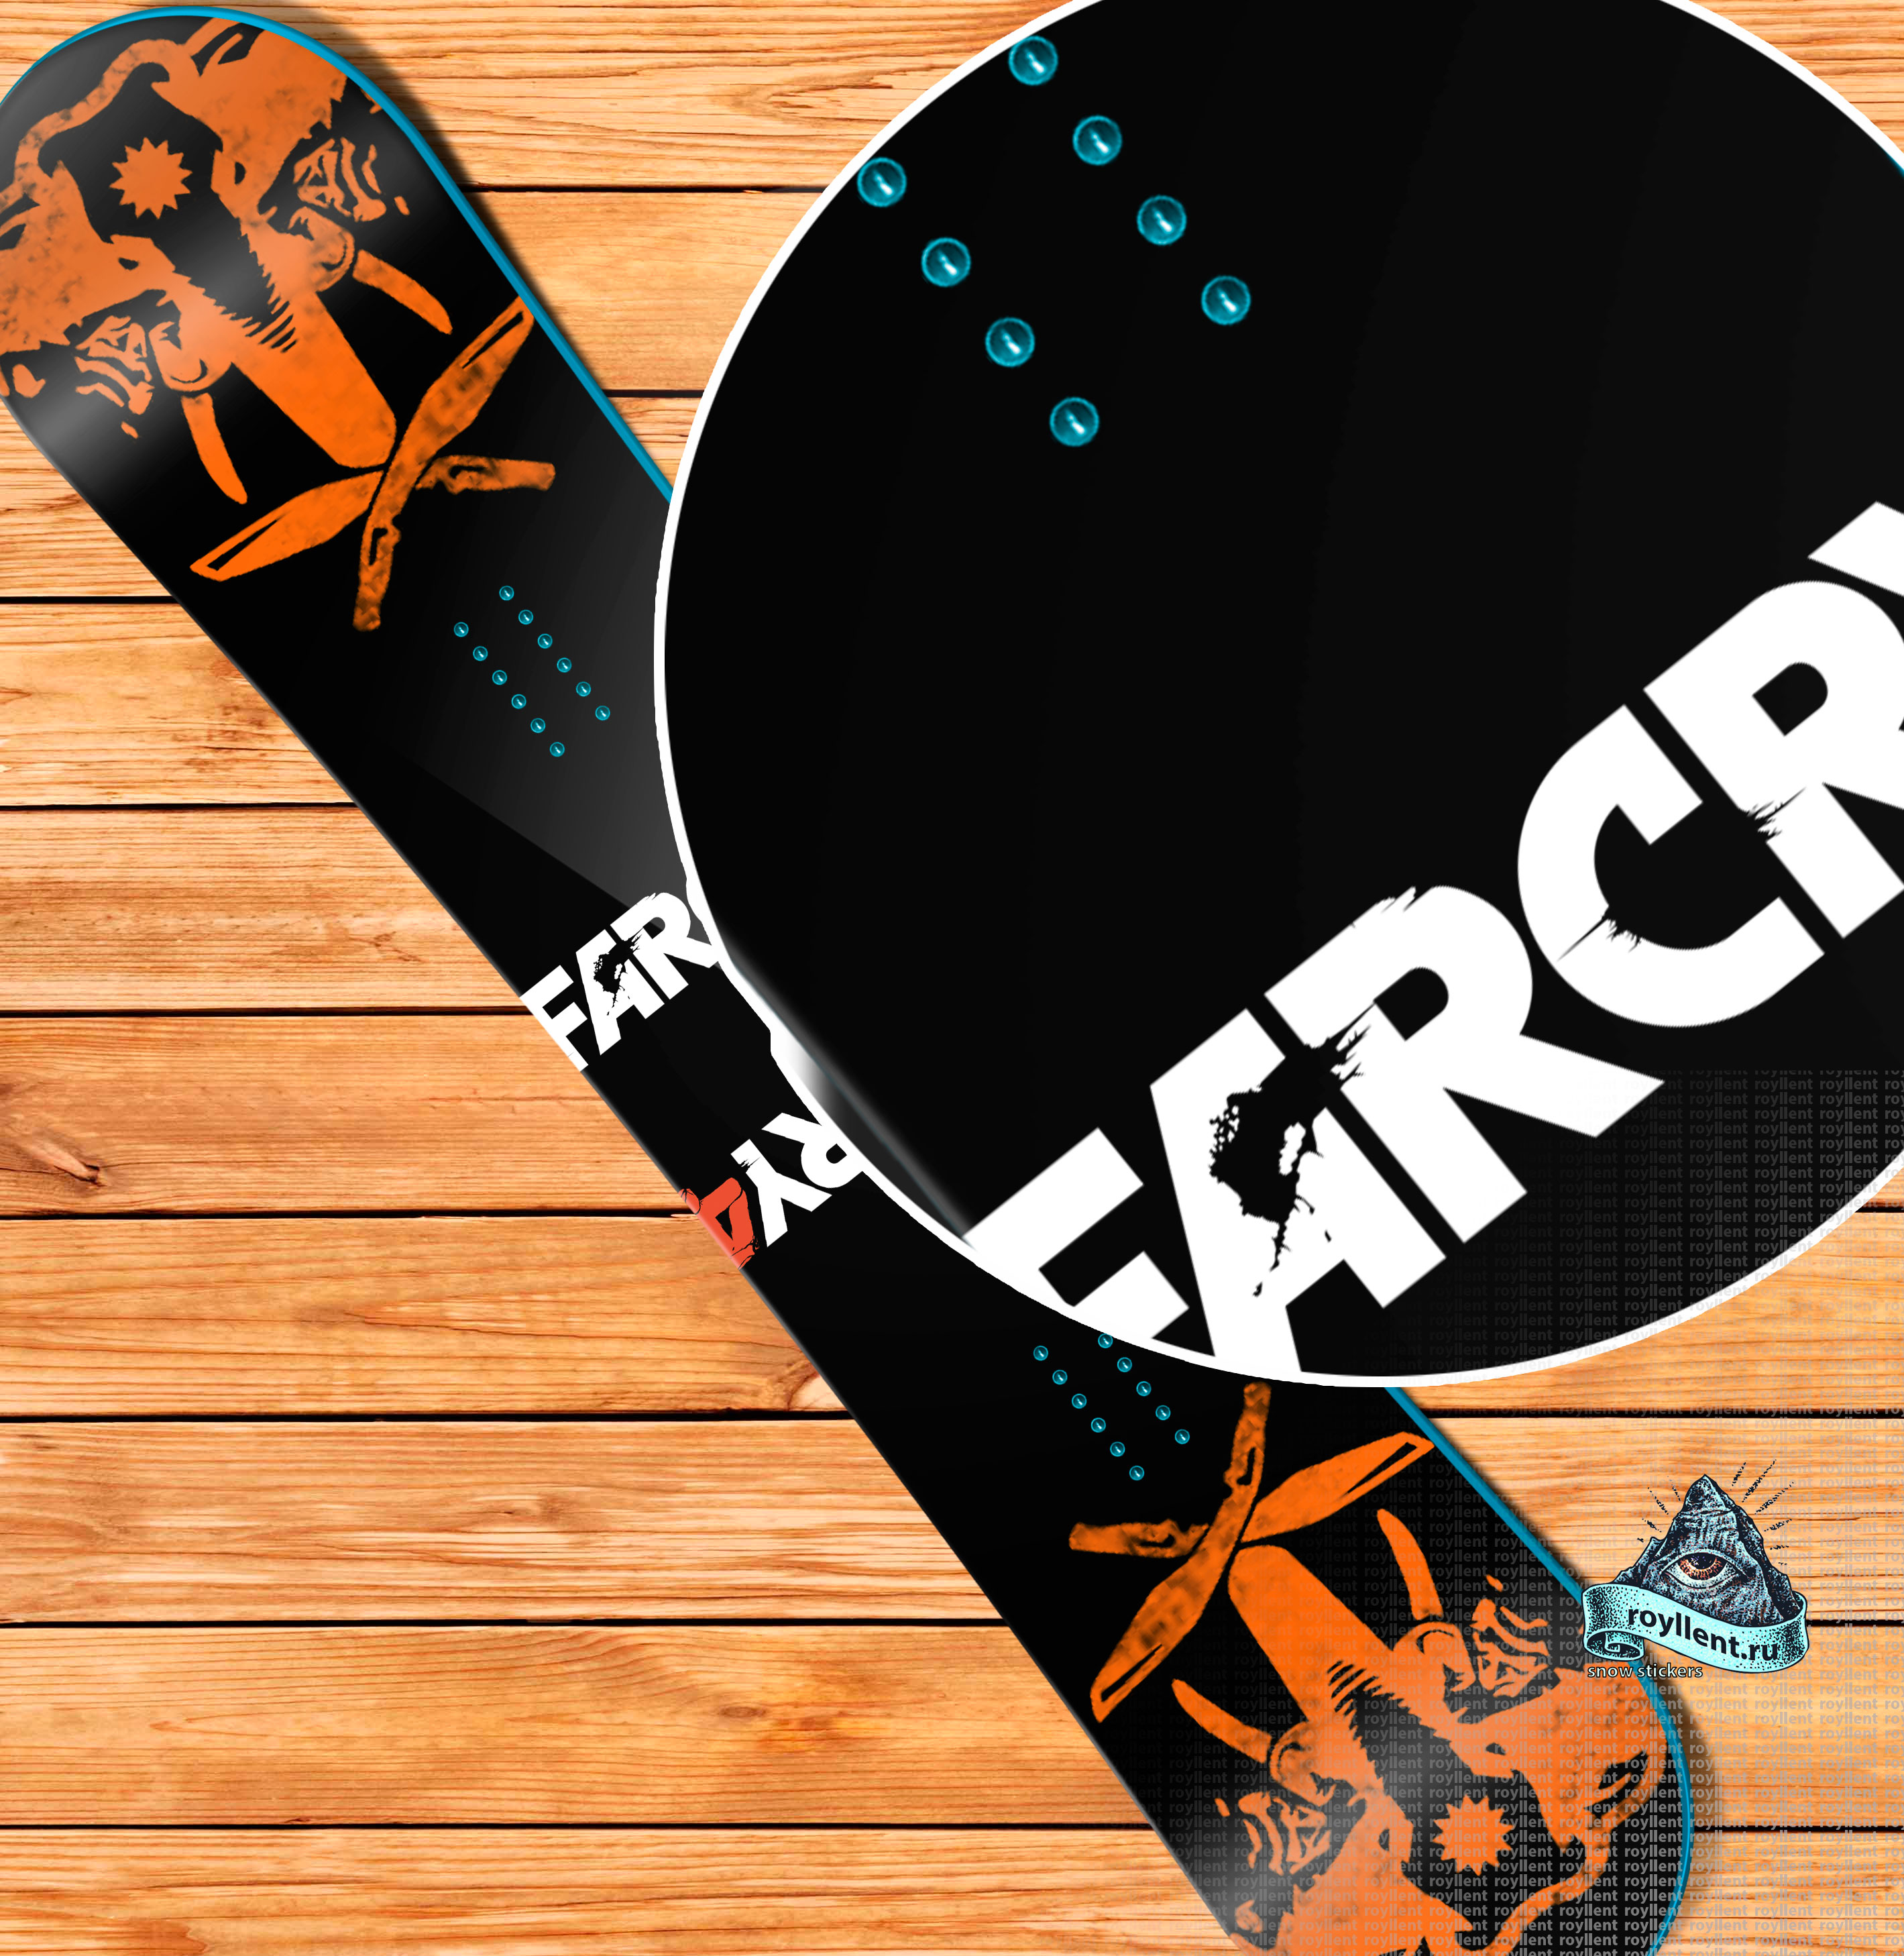 Наклейка FarCry 4, полноразмерная наклейка FarCry 4, наклейка на доску FarCry 4 , сноуборд наклейка FarCry 4 , виниловая наклейка FarCry 4, магазин наклеек FarCry 4, купить наклейку FarCry 4 , стикер FarCry 4 , sticker FarCry 4, наклейка, Полноразмерная наклейка на сноуборд, спб, FarCry 4, Роза хутор наклейка, Шерегеш наклейка, Наклейка Хибины